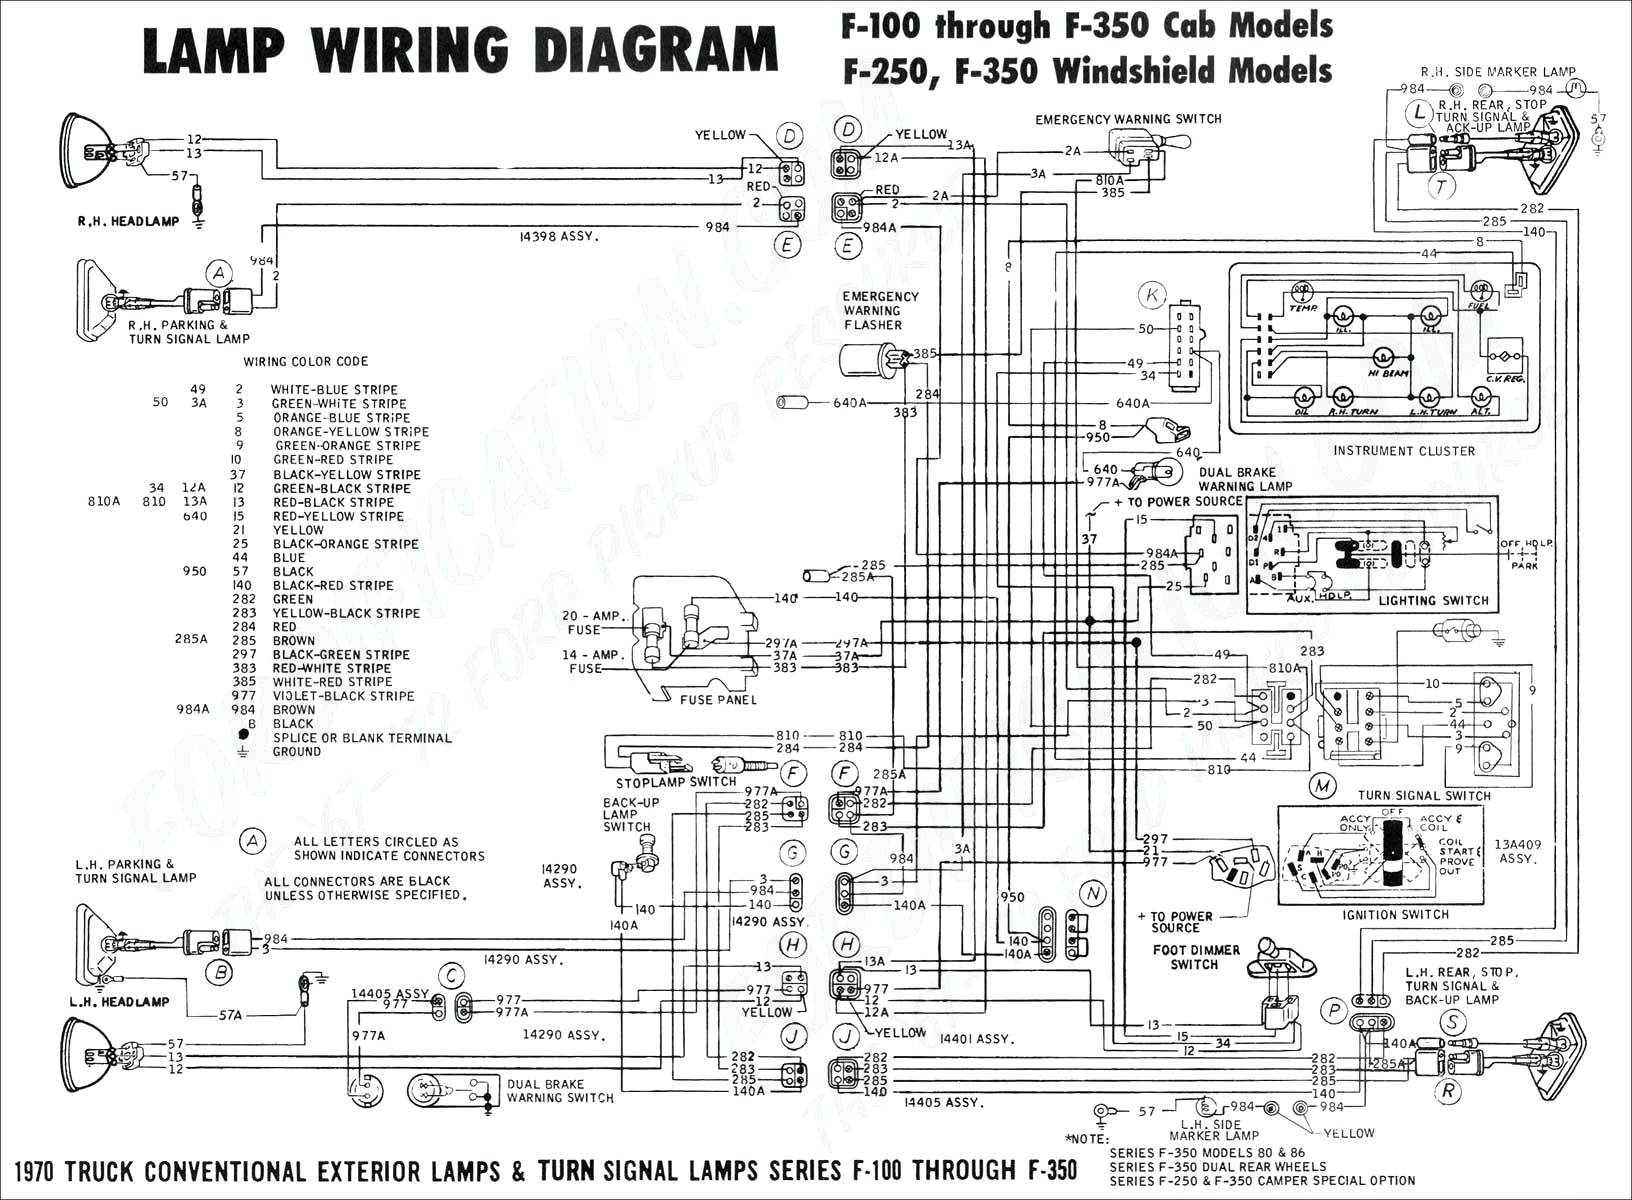 32 2002 Mercury Mountaineer Wiring Diagram Wiring